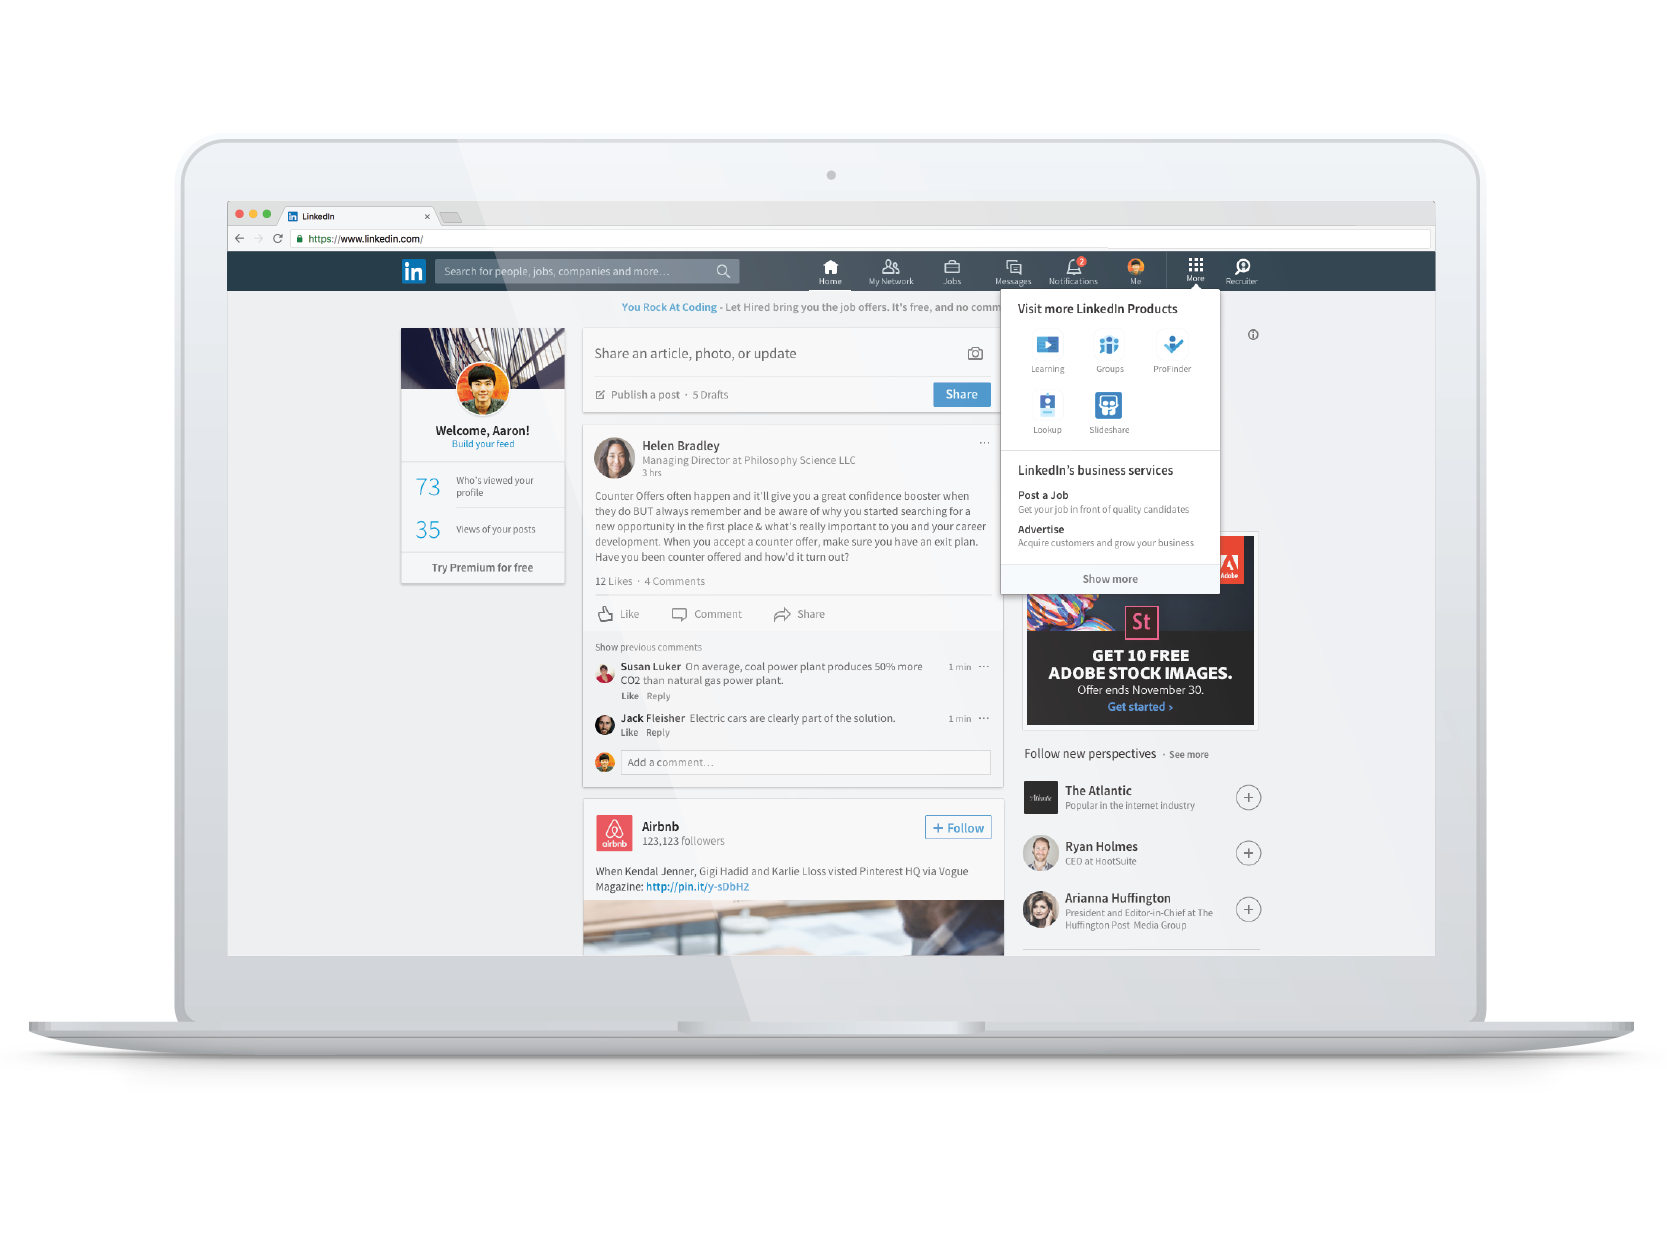 linkedin-desktop-nav.png